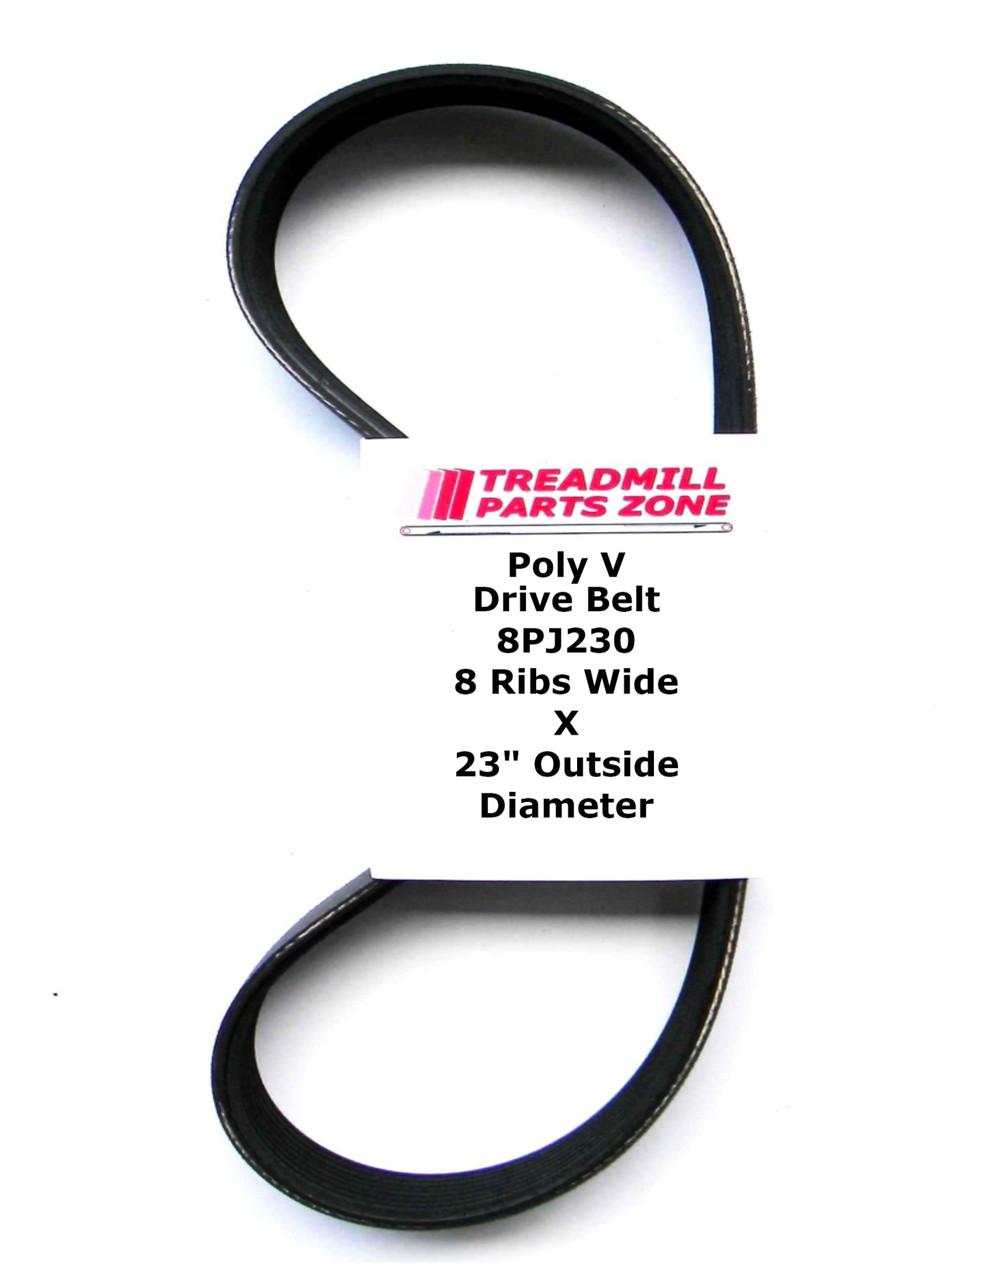 "Poly V Drive Belt 8PJ230 8 Ribs Wide X 23"" Outside Diameter"